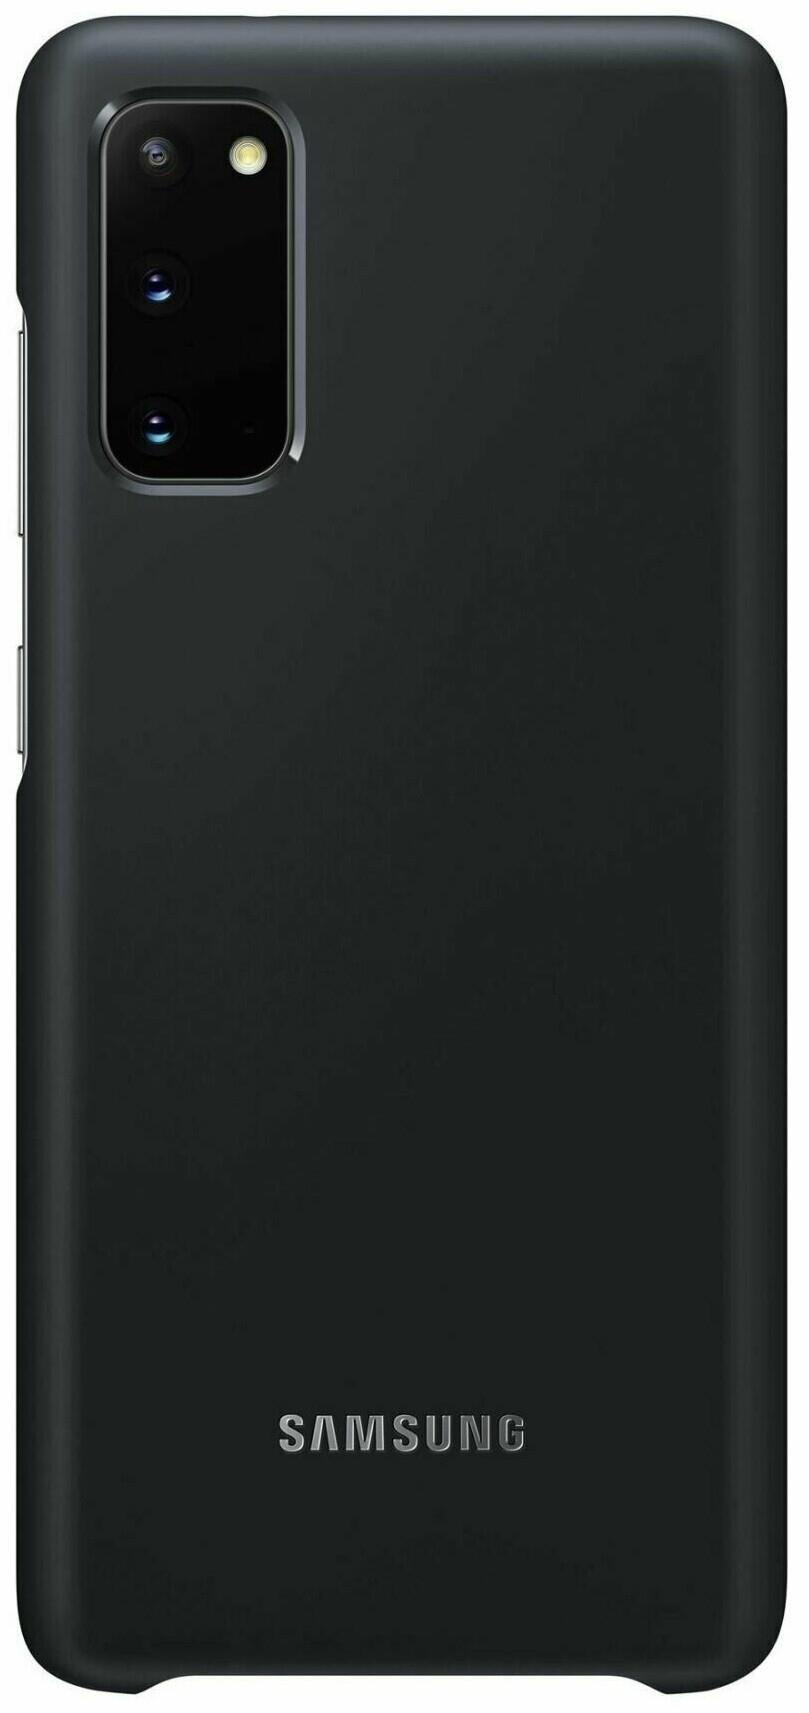 Панель Samsung LED Cover для Samsung Galaxy S20 (EF-KG980CBEGRU) Black от Територія твоєї техніки - 2